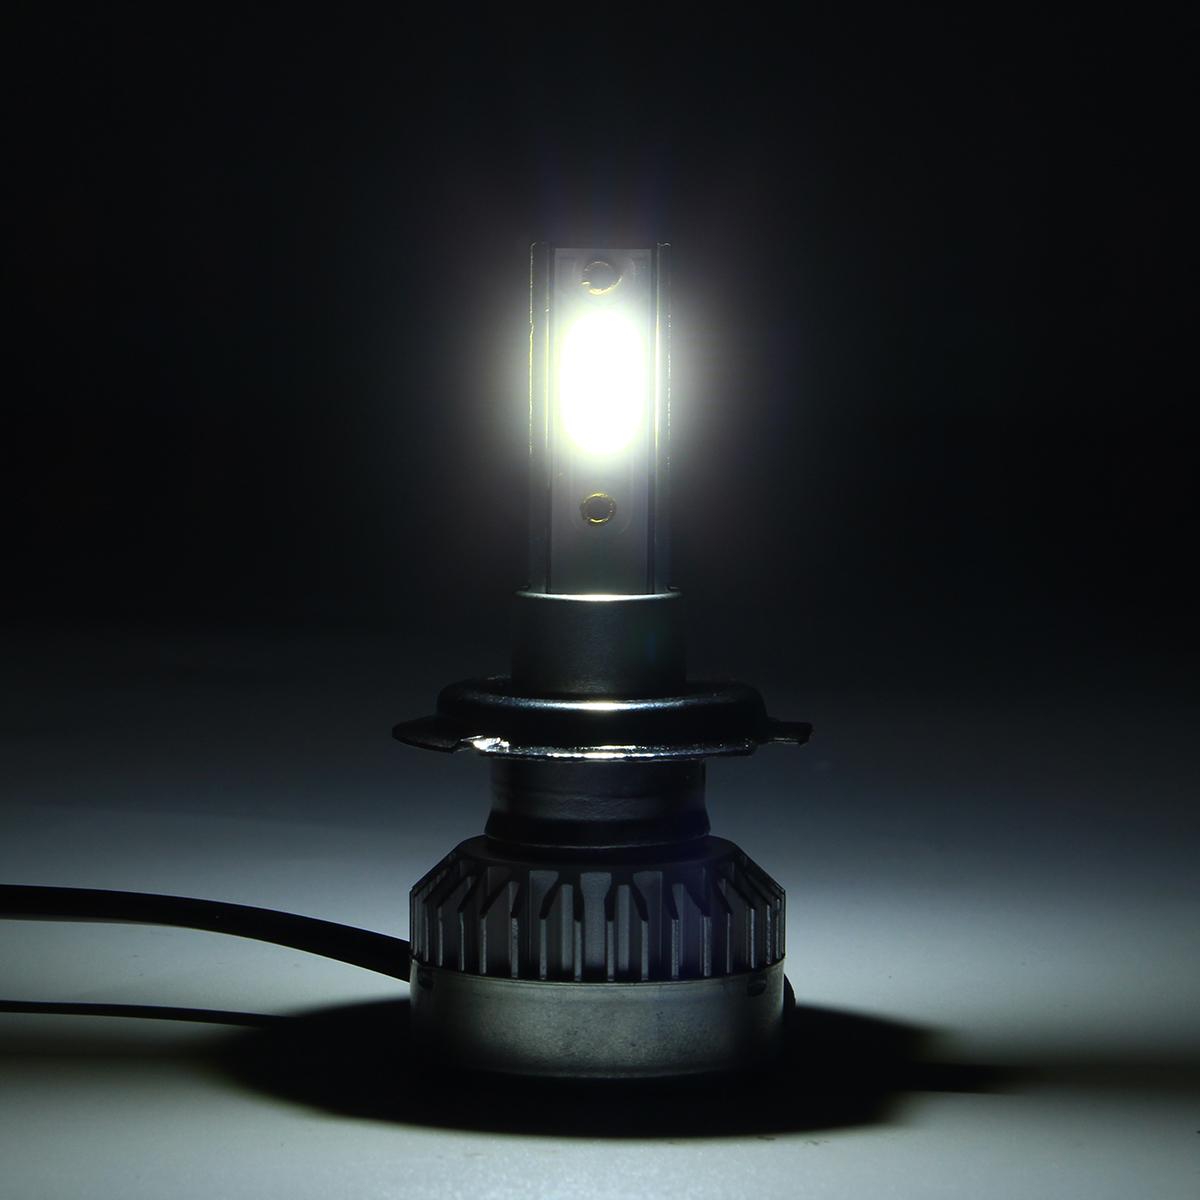 TXVSO8 G1 COB LED Car Headlights Bulbs H7 H11 H1 9012 9006 9005 Fog Lights 110W 20000LM 6000K White Waterproof